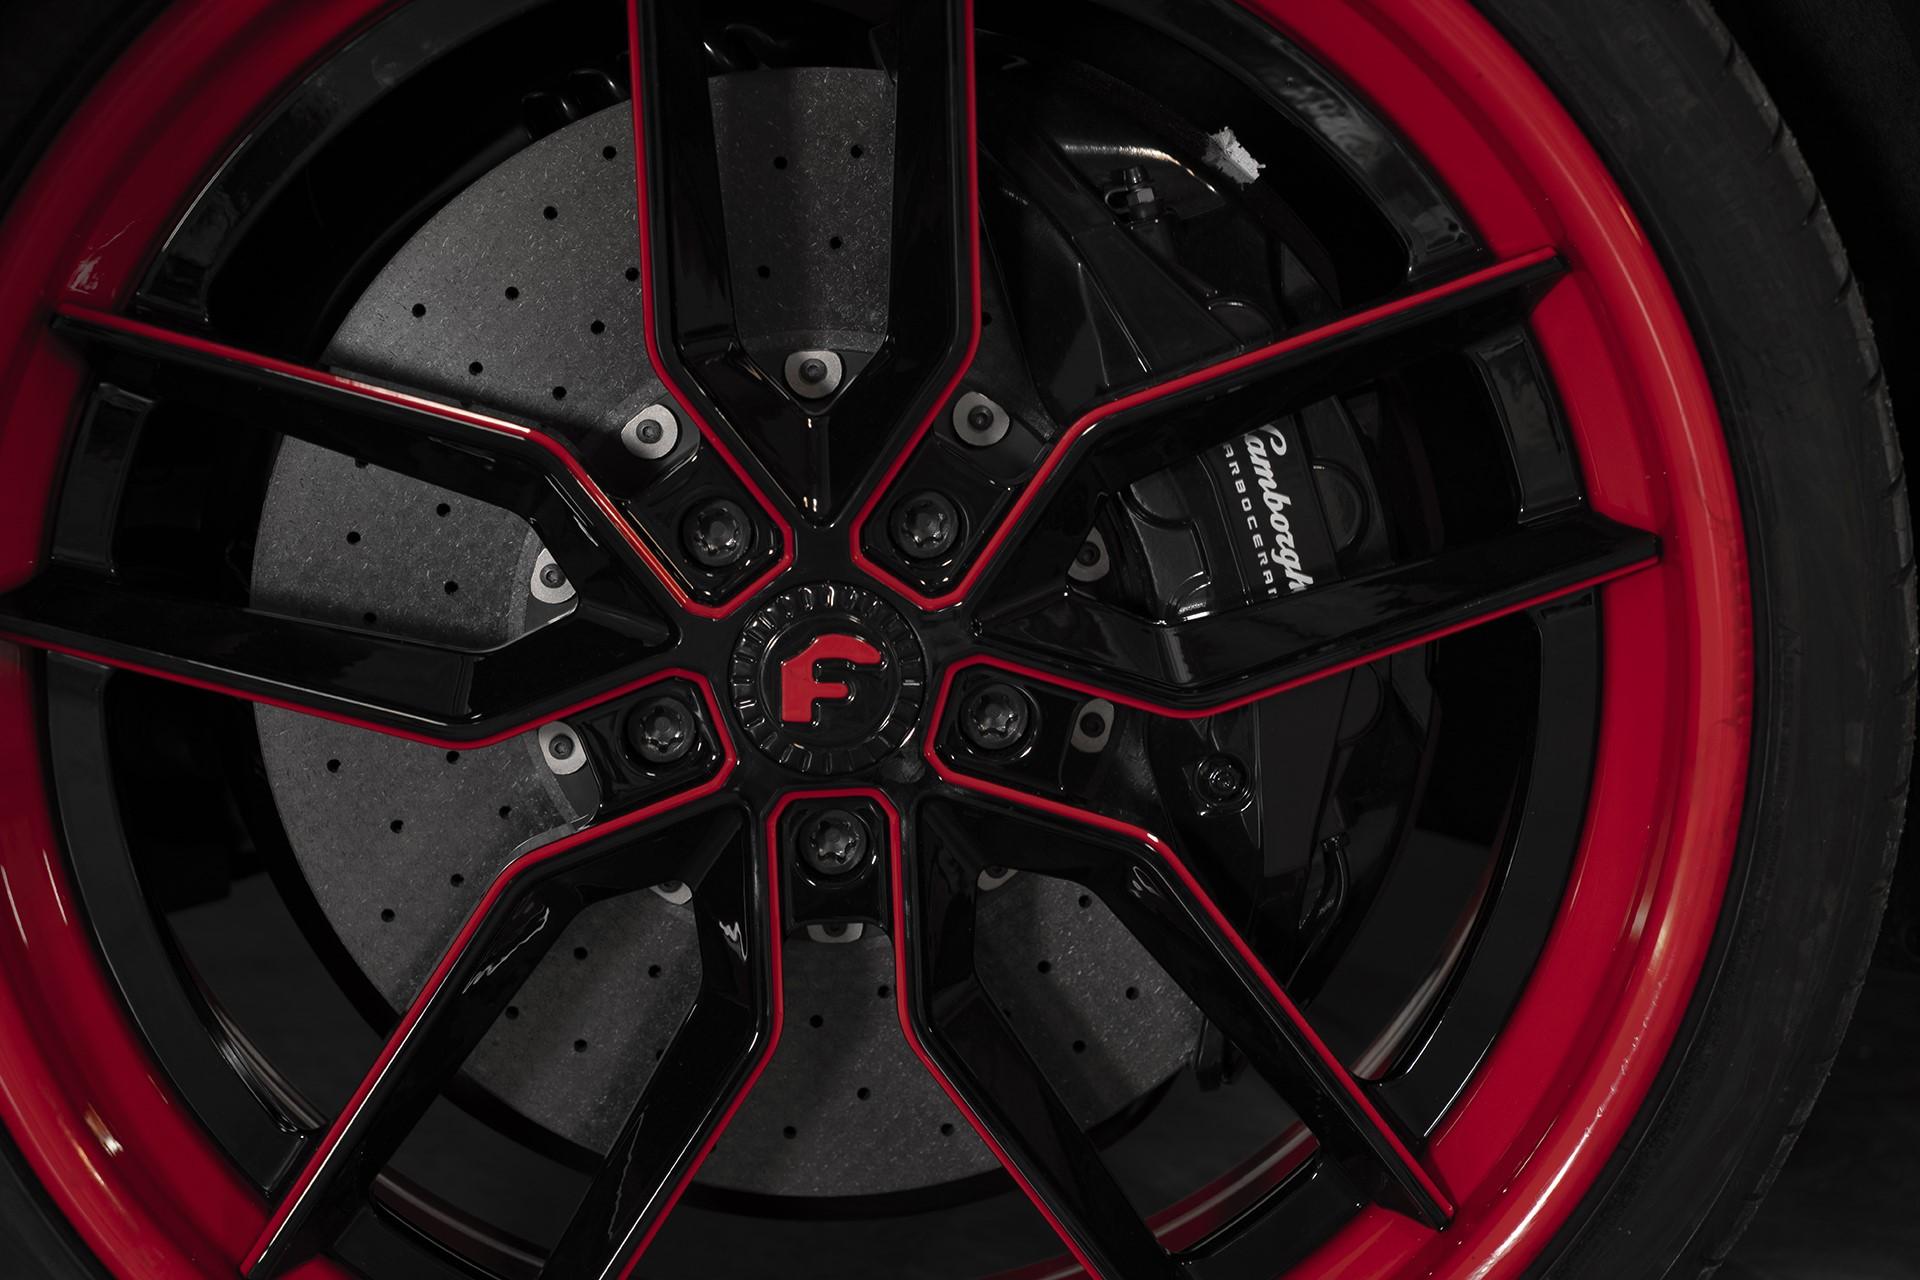 forgiato-custom-wheel-lamborghini-urus-tec_3.9-tecnica-12-21-2018_5c1d5c1351a84_3